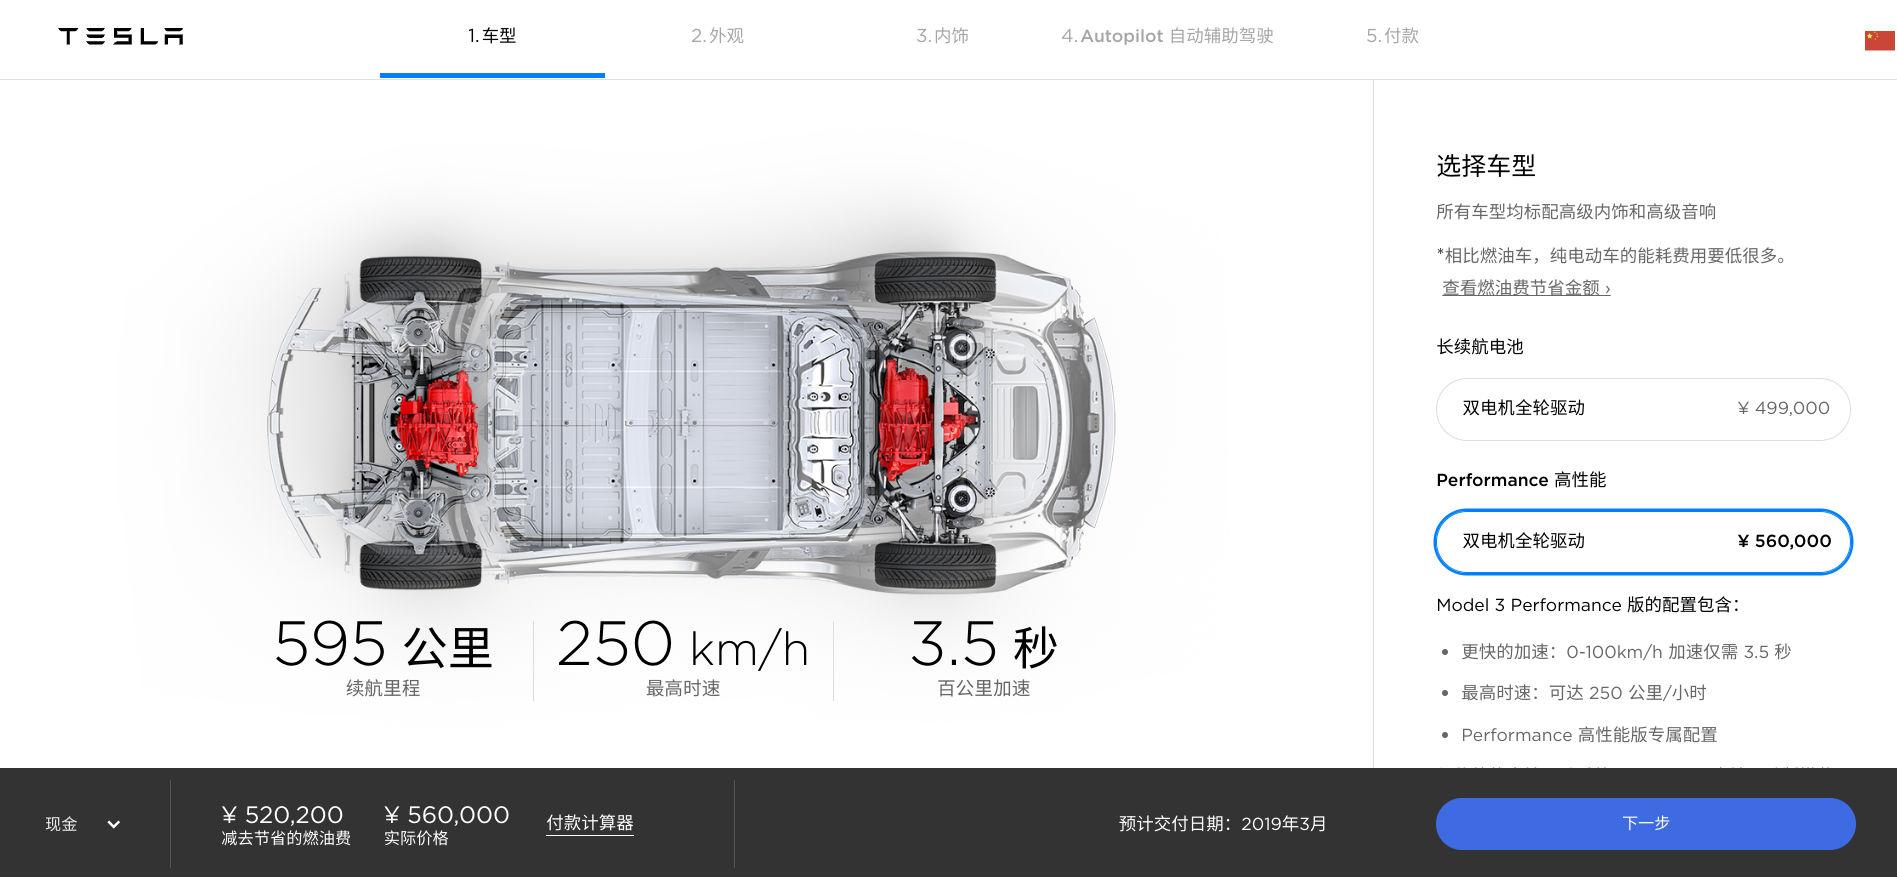 Tesla Powerwall 2 >> Tesla Model 3 configurator in China teases March ...